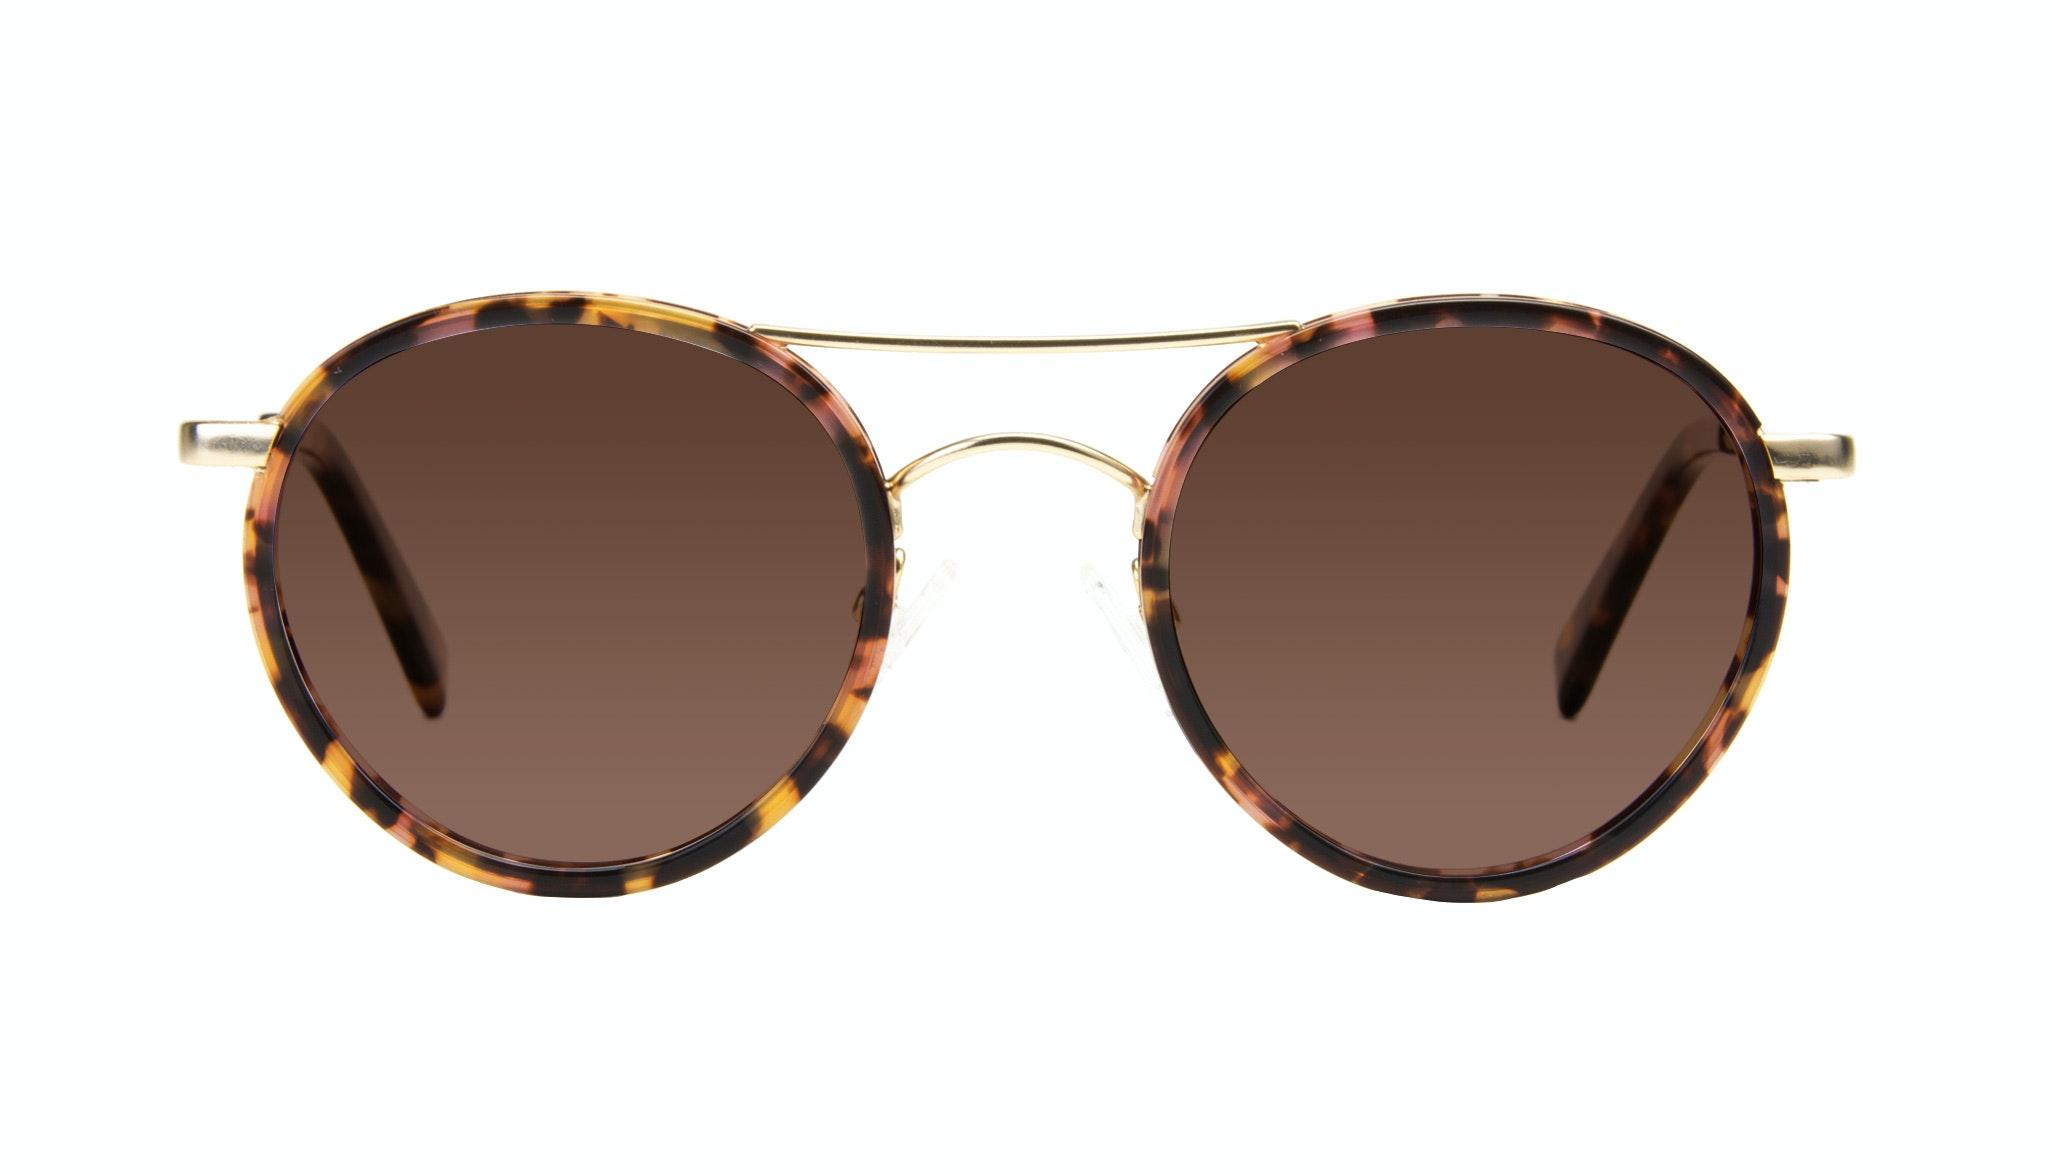 Affordable Fashion Glasses Aviator Round Sunglasses Women Chelsea Gold Tortoise